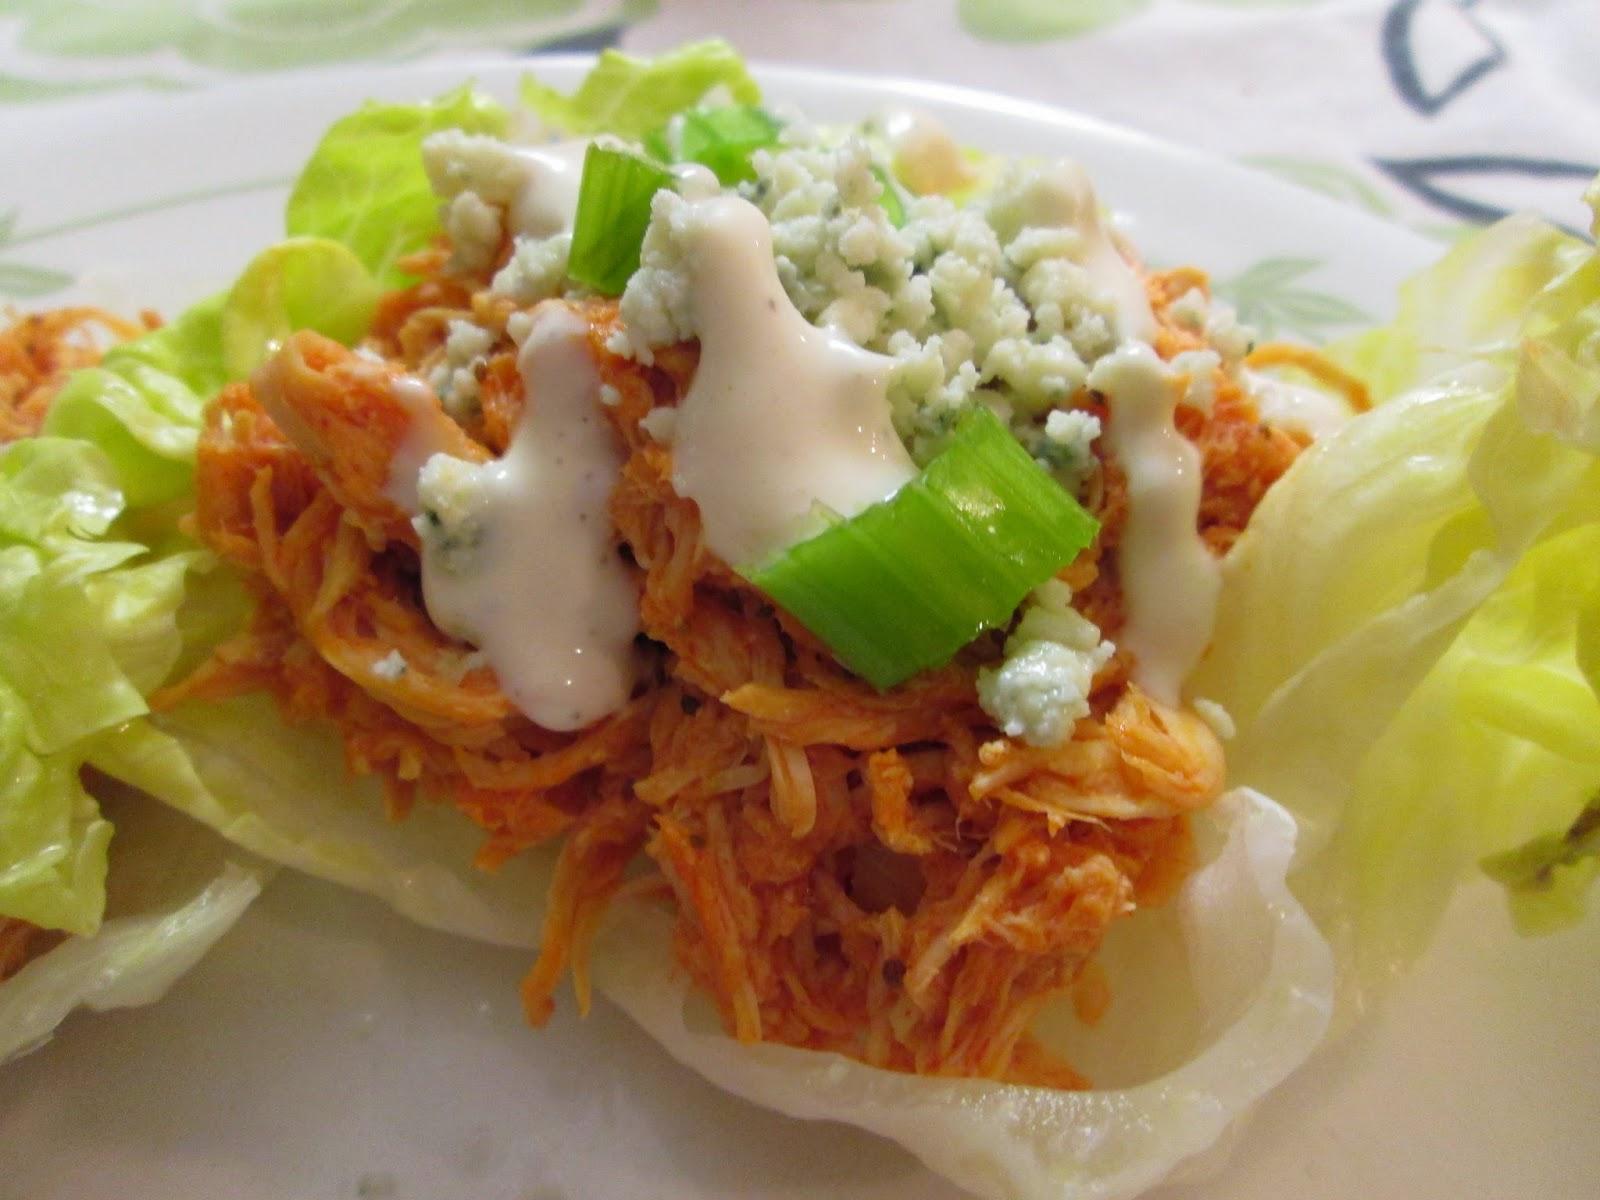 Neighbor Julia: Crockpot Buffalo Chicken Lettuce Wraps